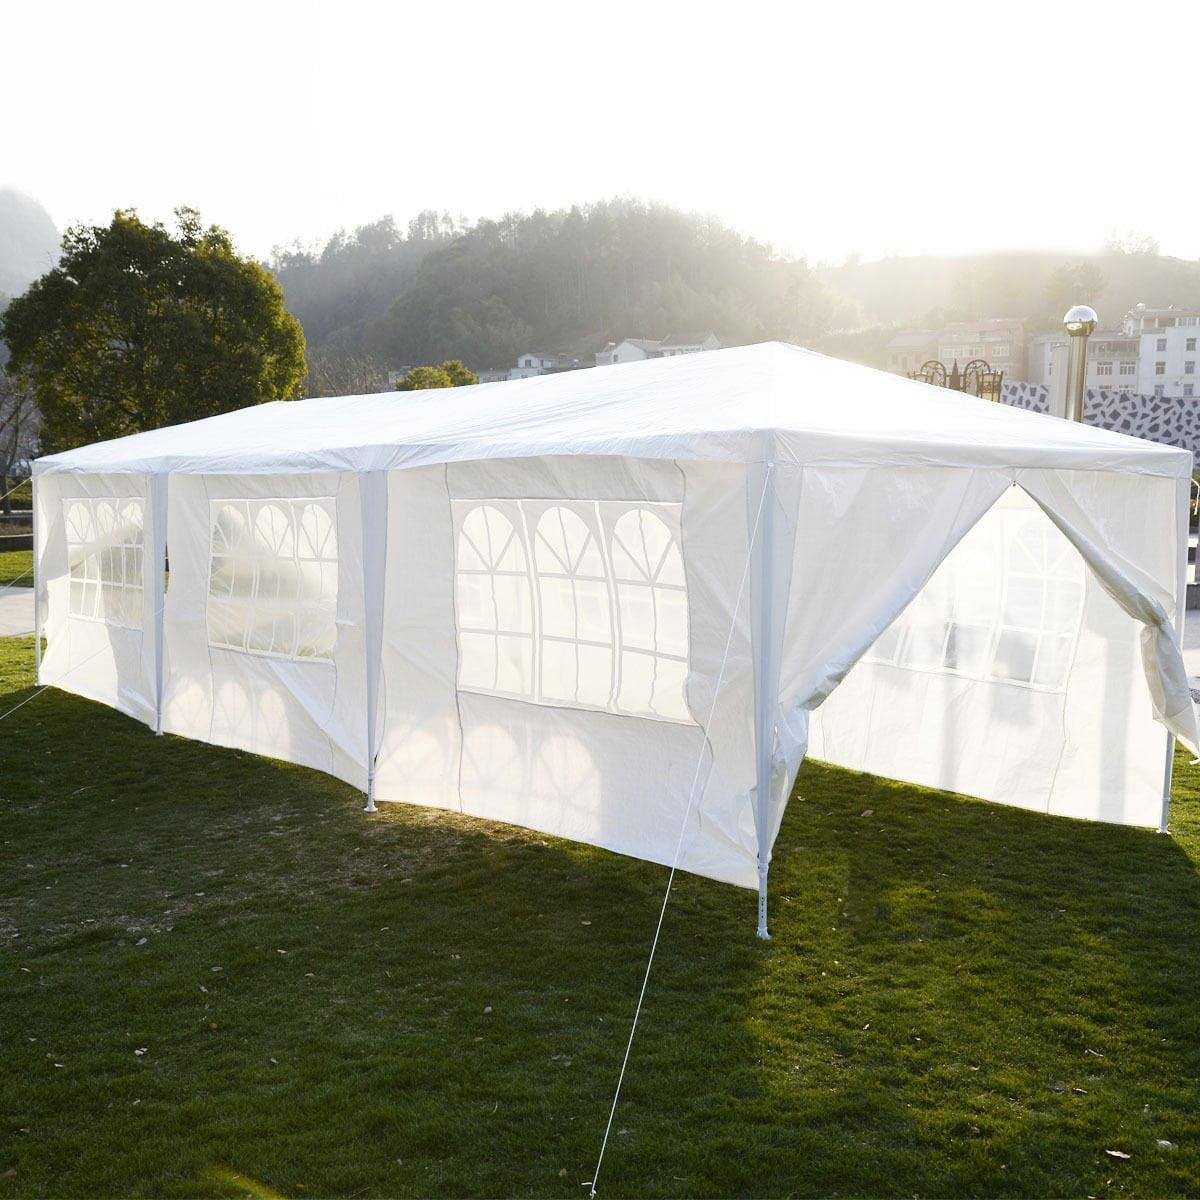 New MTN-G MTN-G 10'x30'Canopy Party Wedding Tent Outdoor Heavy duty Gazebo